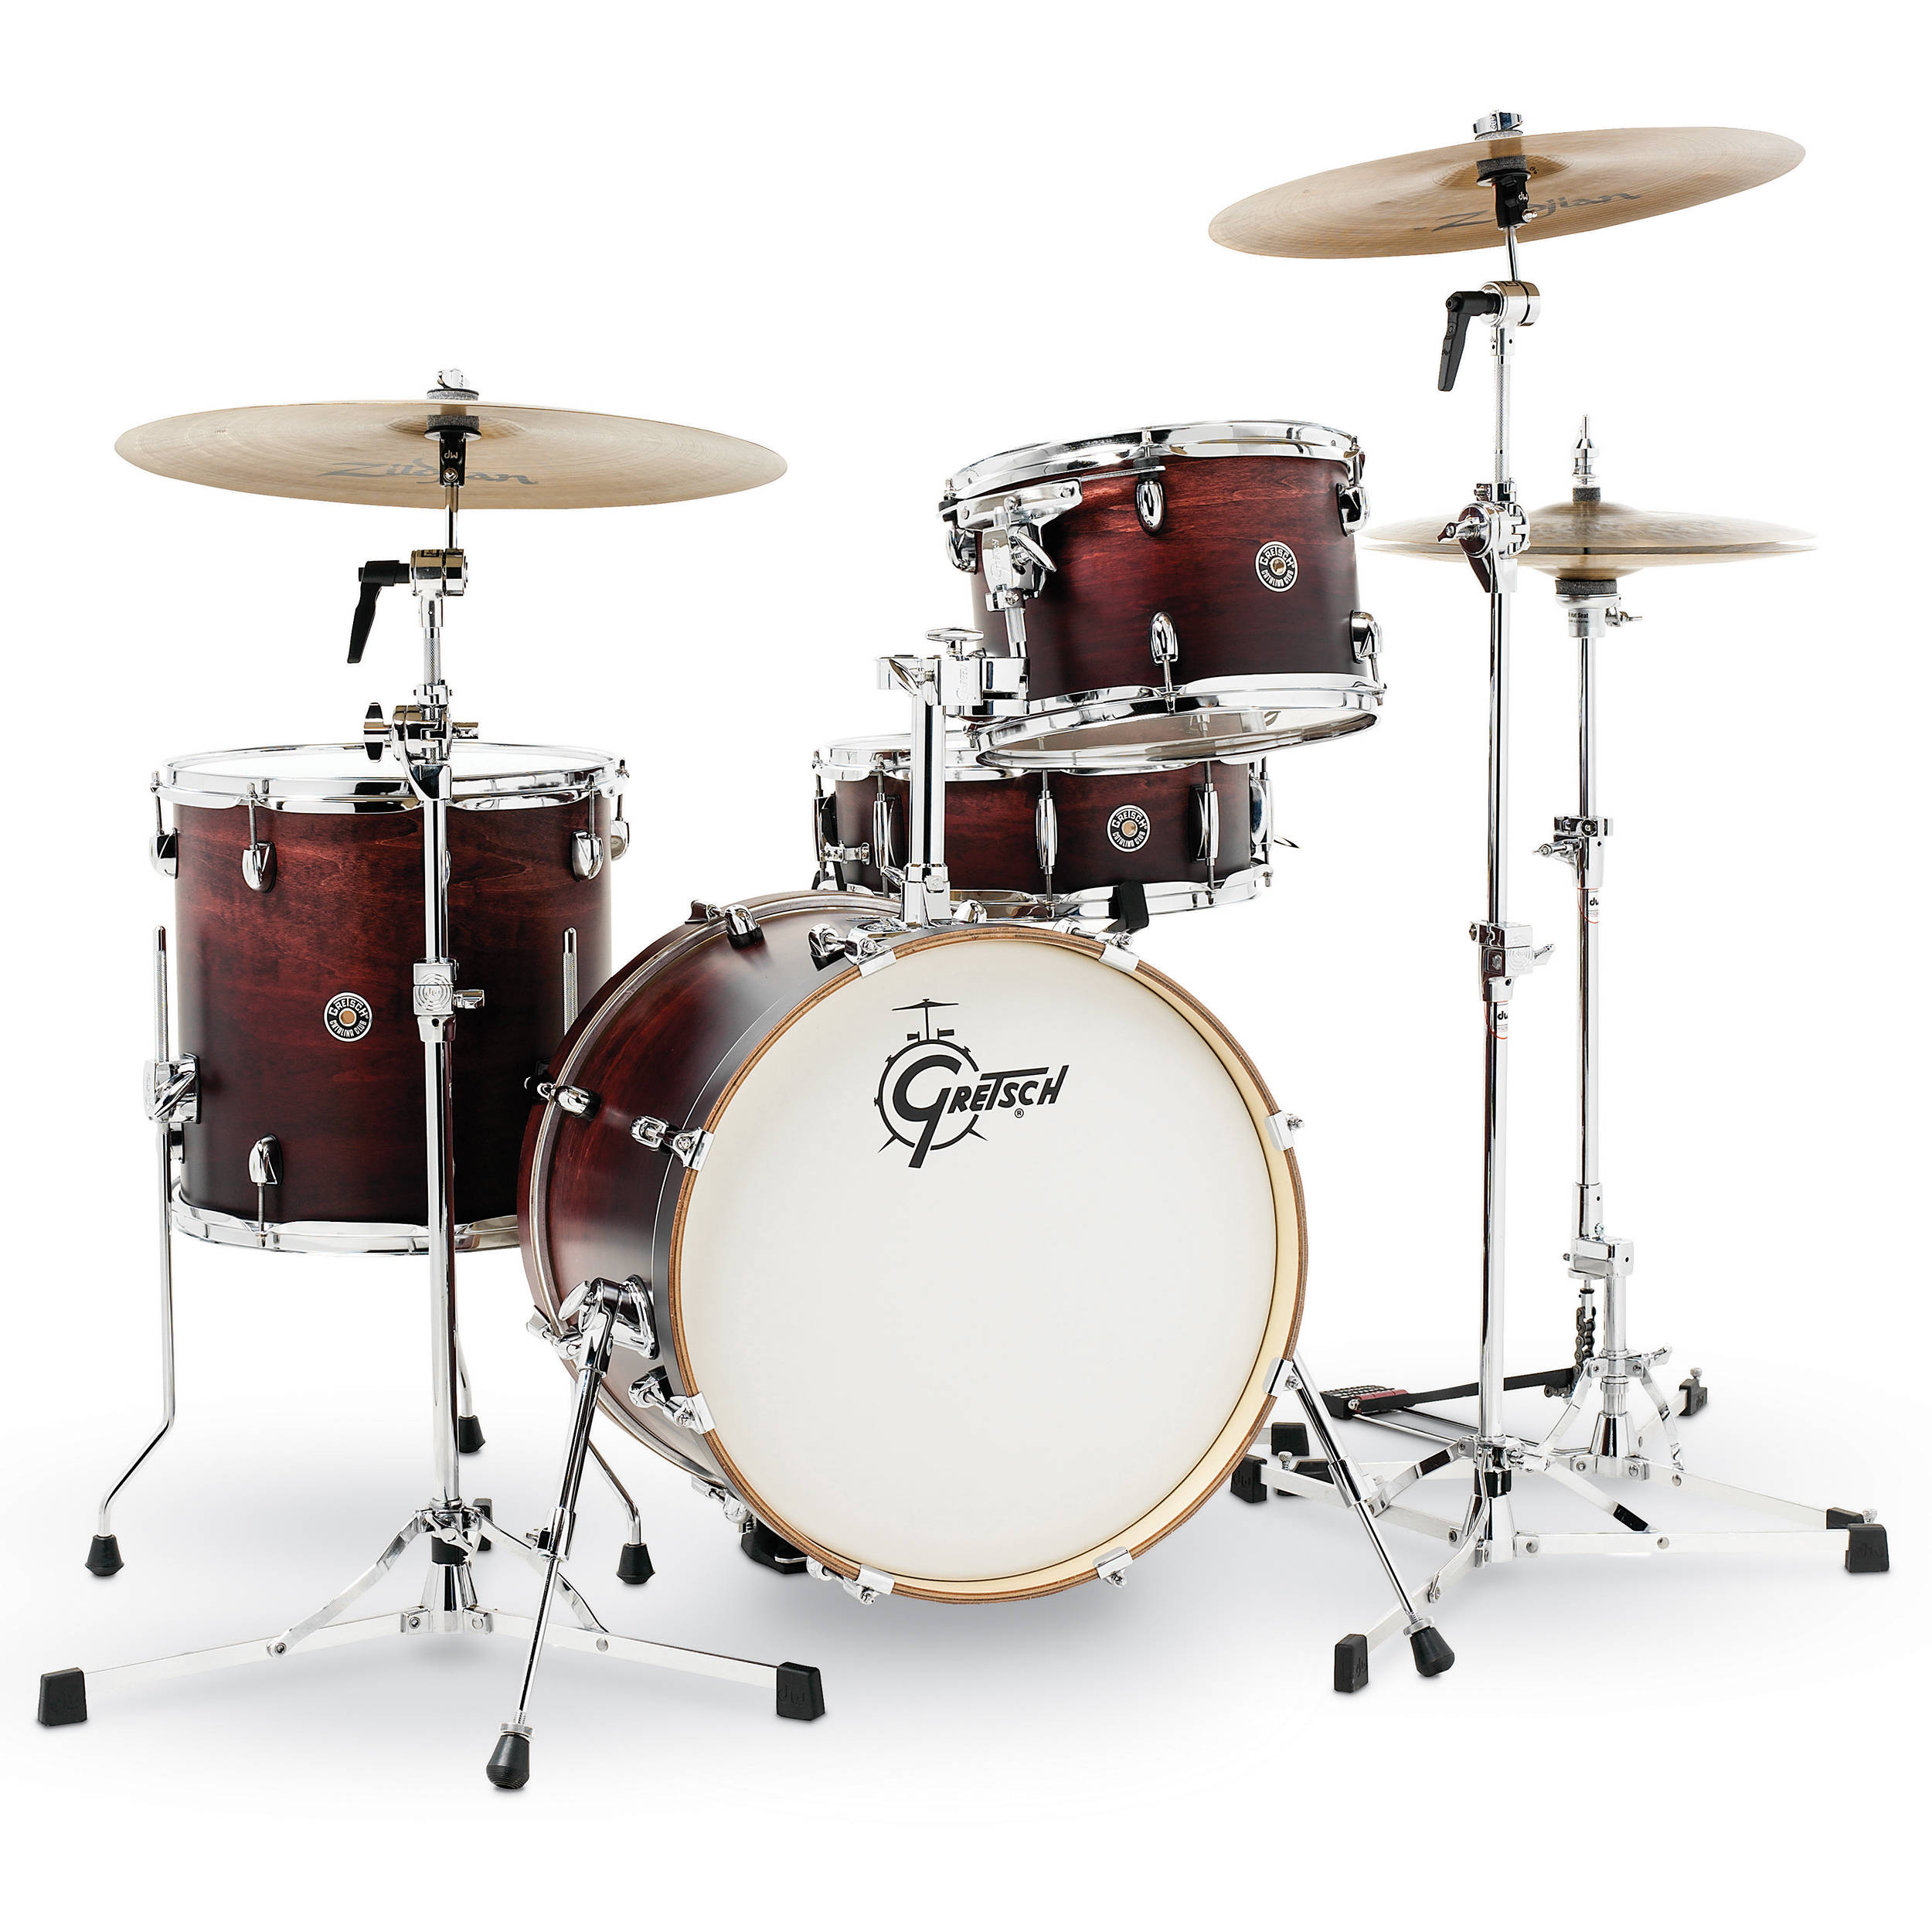 Dating gretsch snare trommer